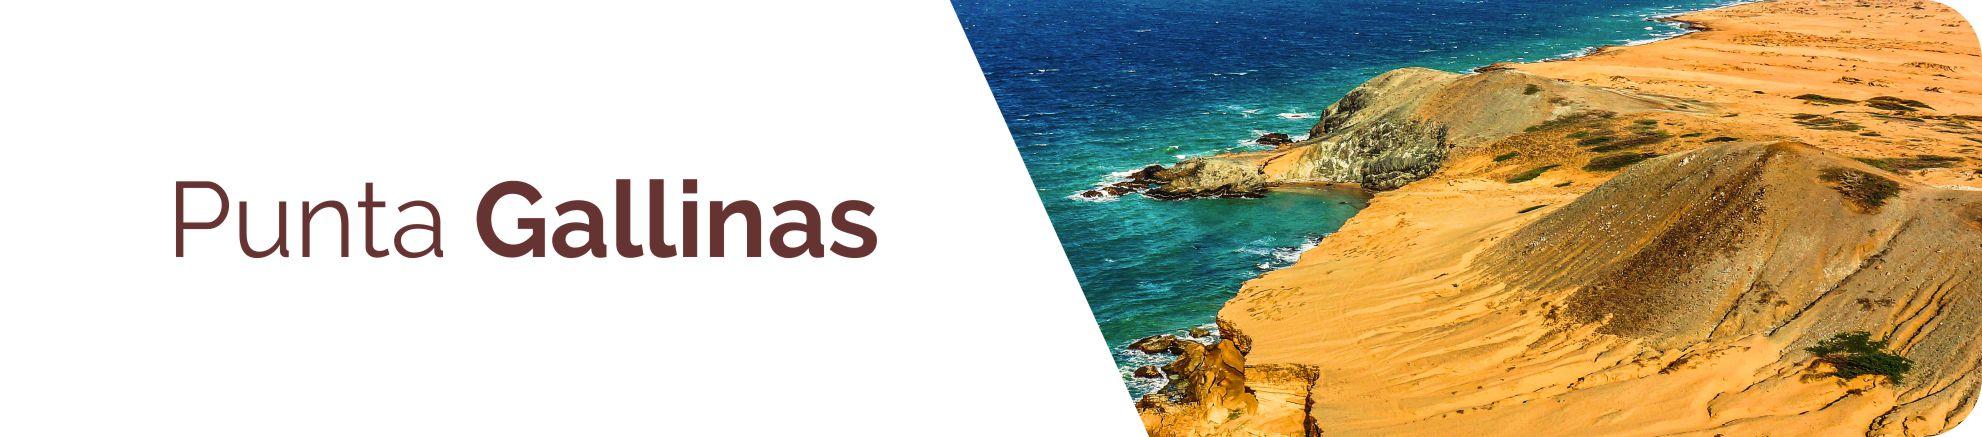 punta-gallinas-expotur-guajira-colombia-suramerica